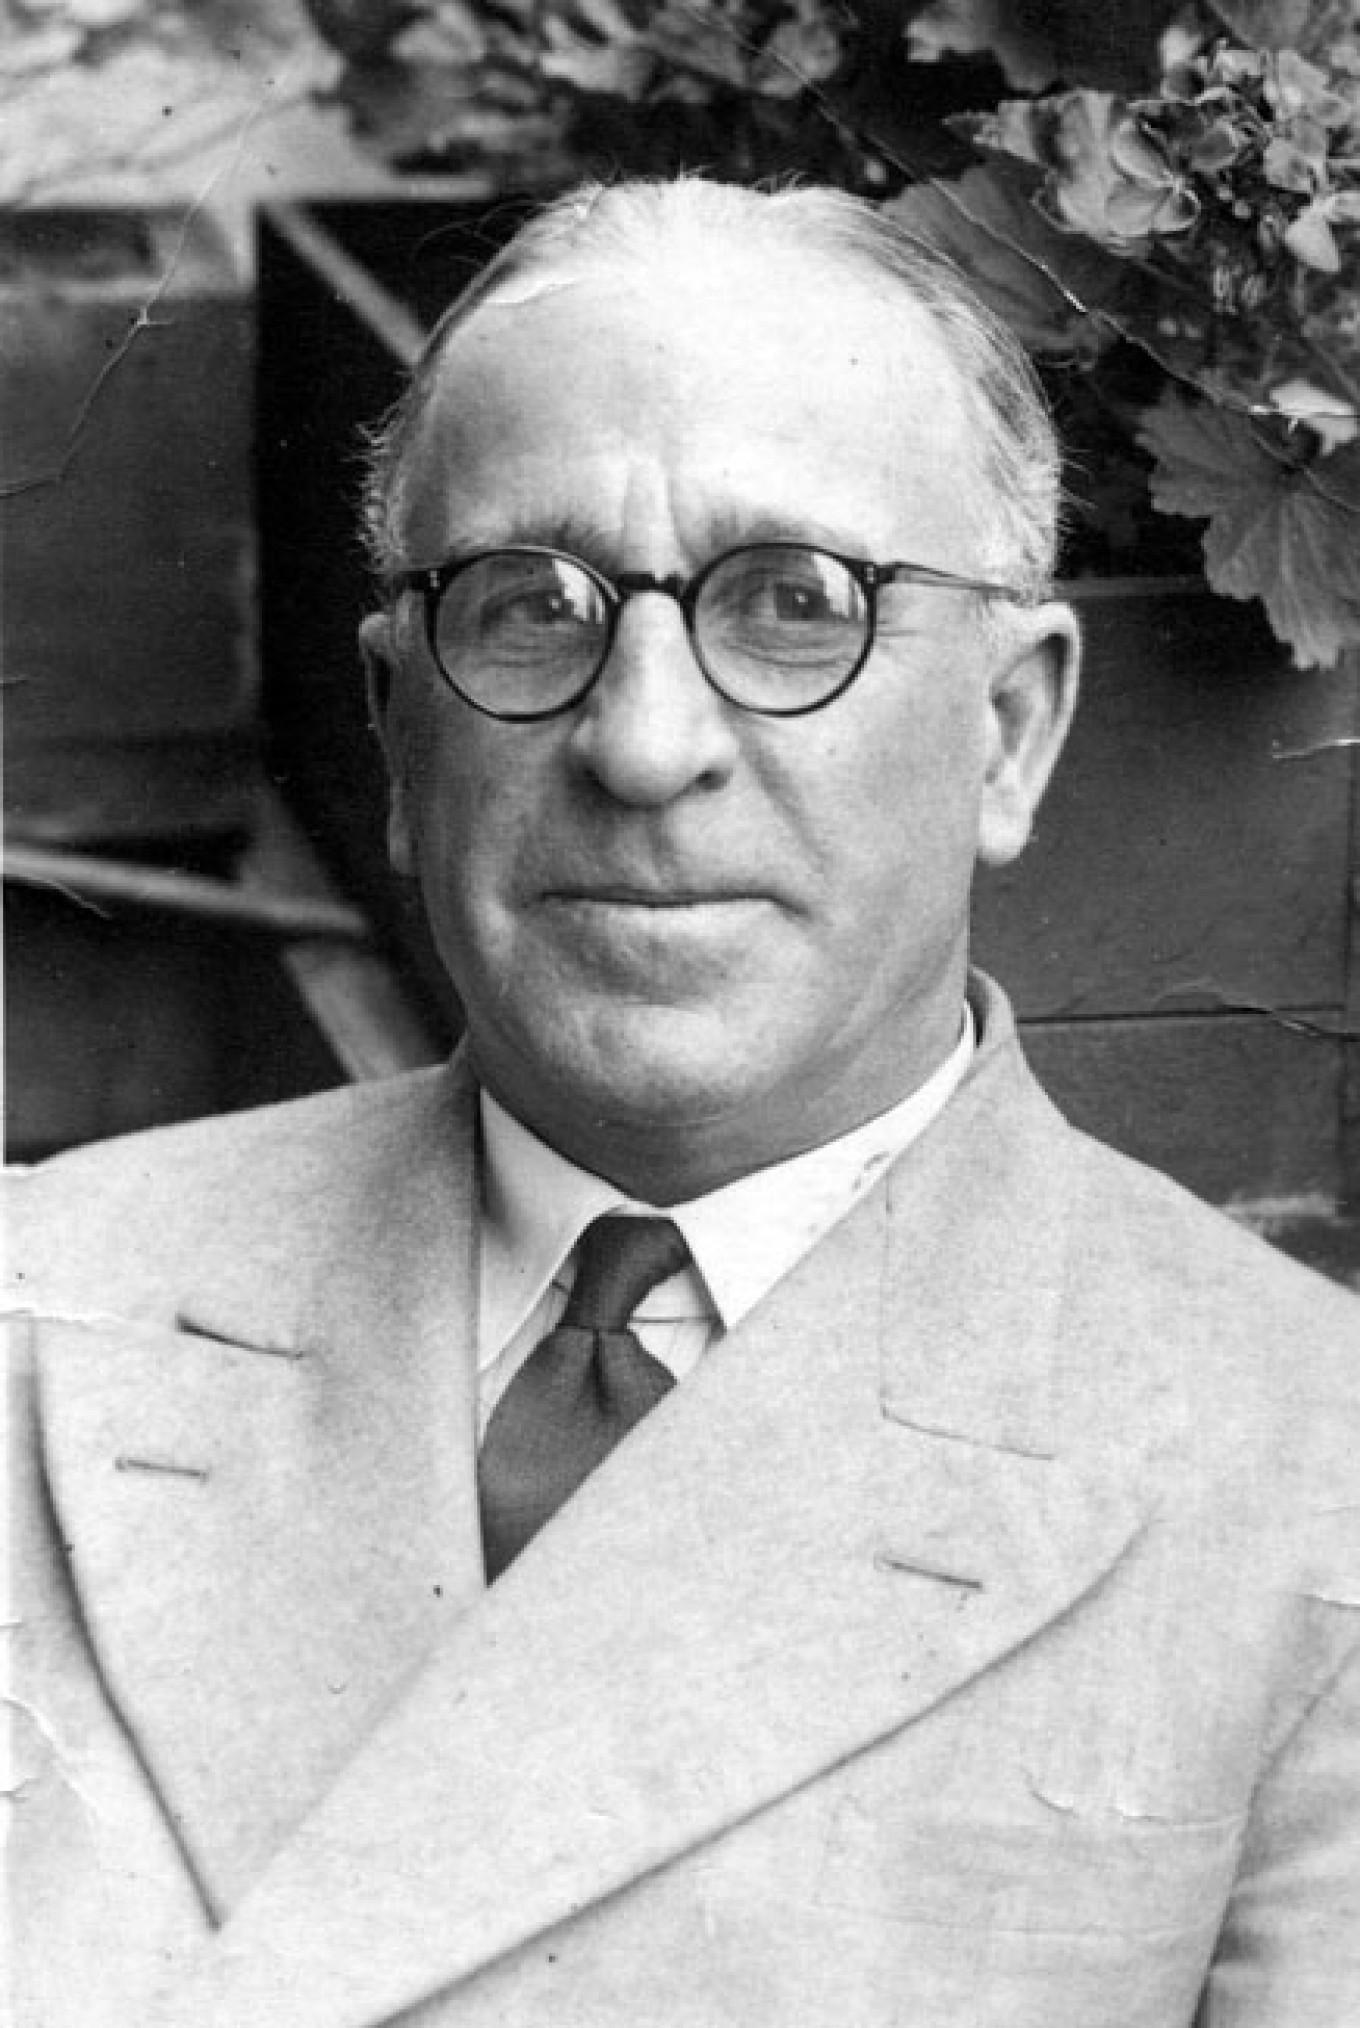 Major Francis Edward Foley